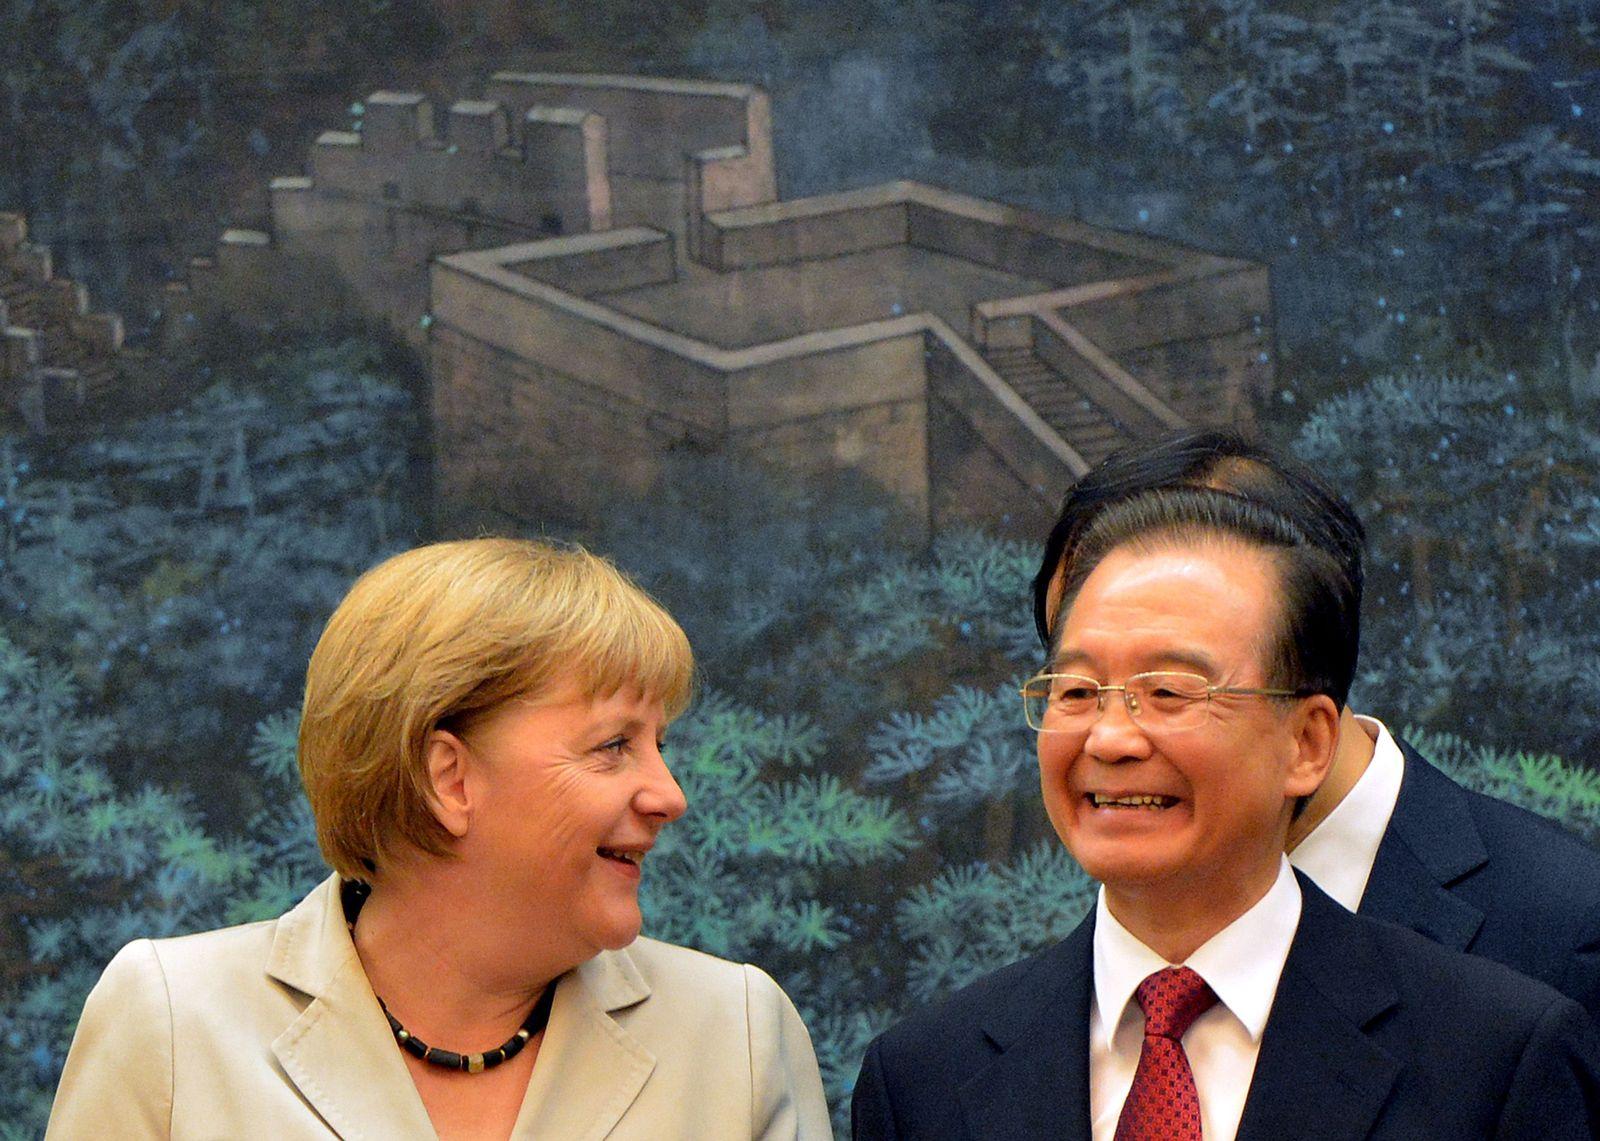 Angela merkel Wen Jiabao